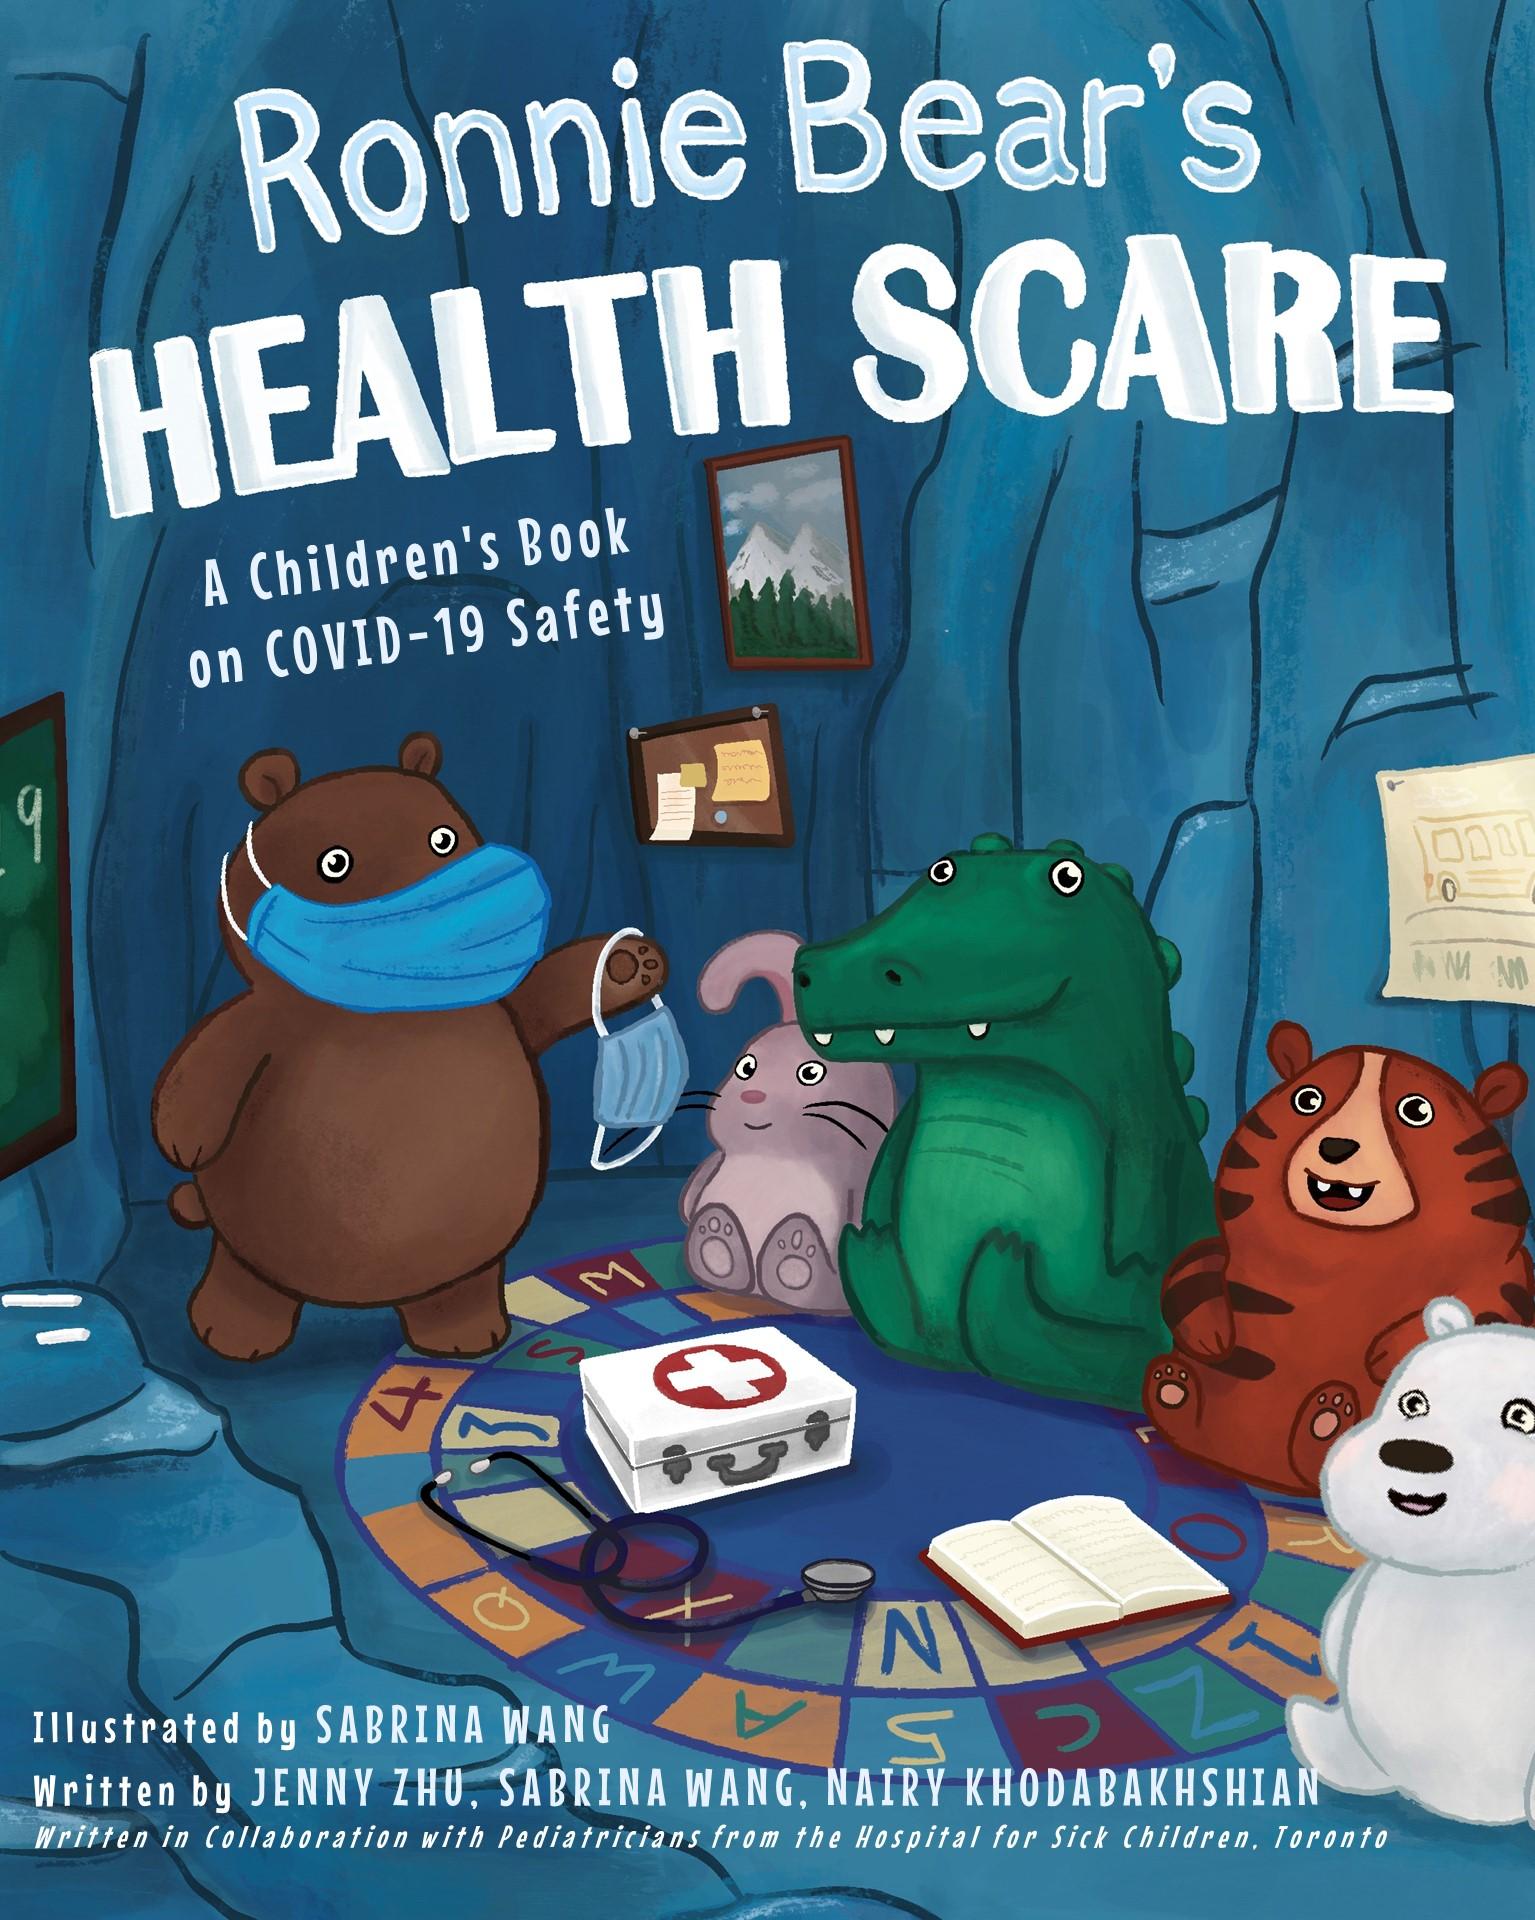 Ronnie Bear's Health Scare Book Cover